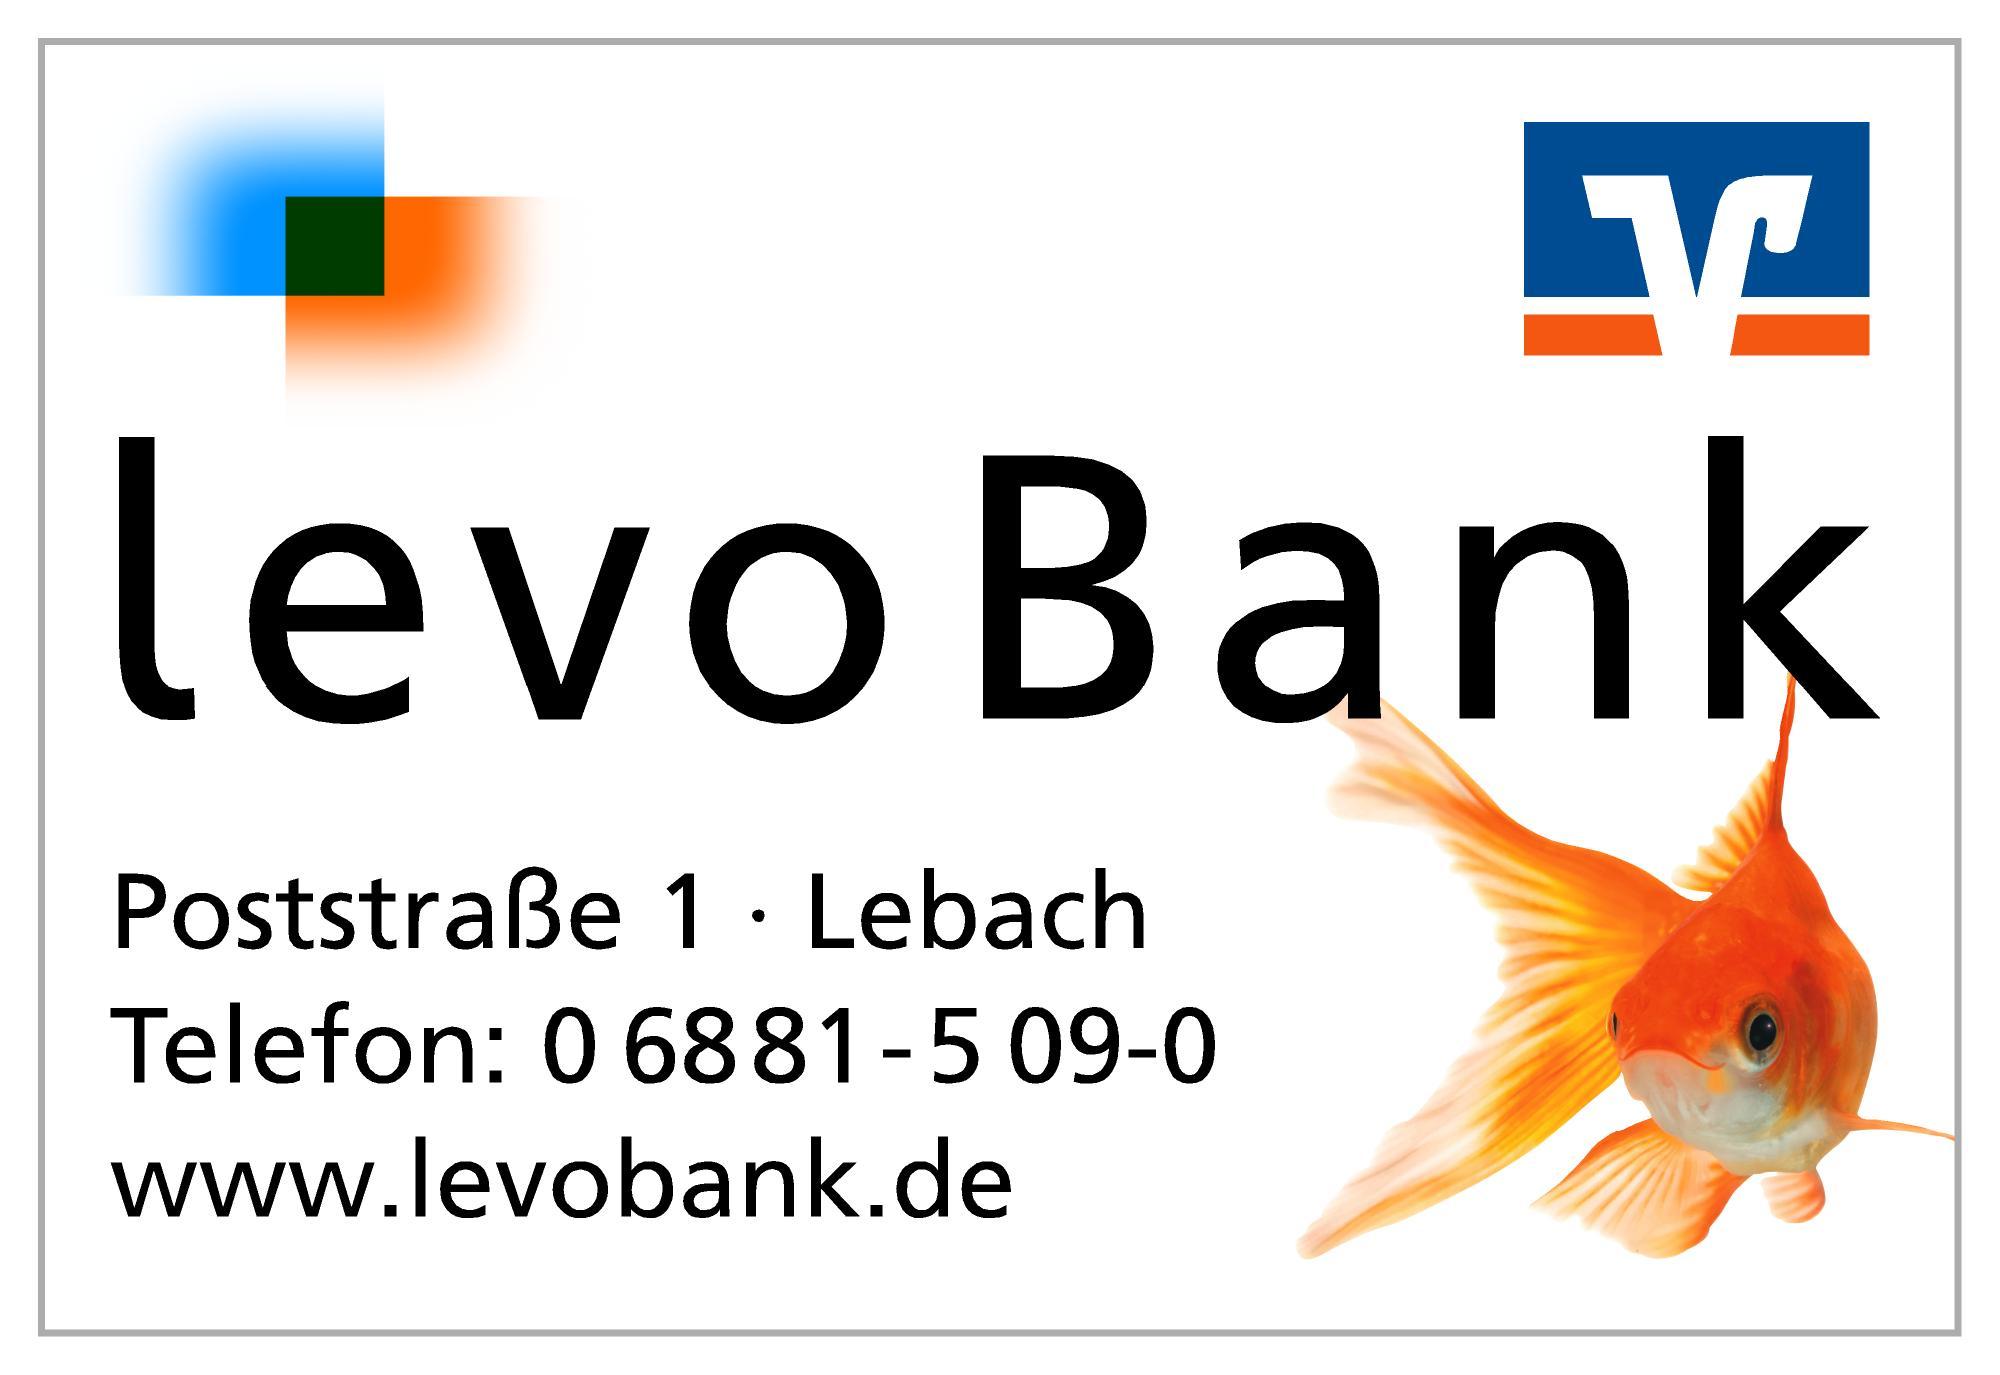 Levobank online banking